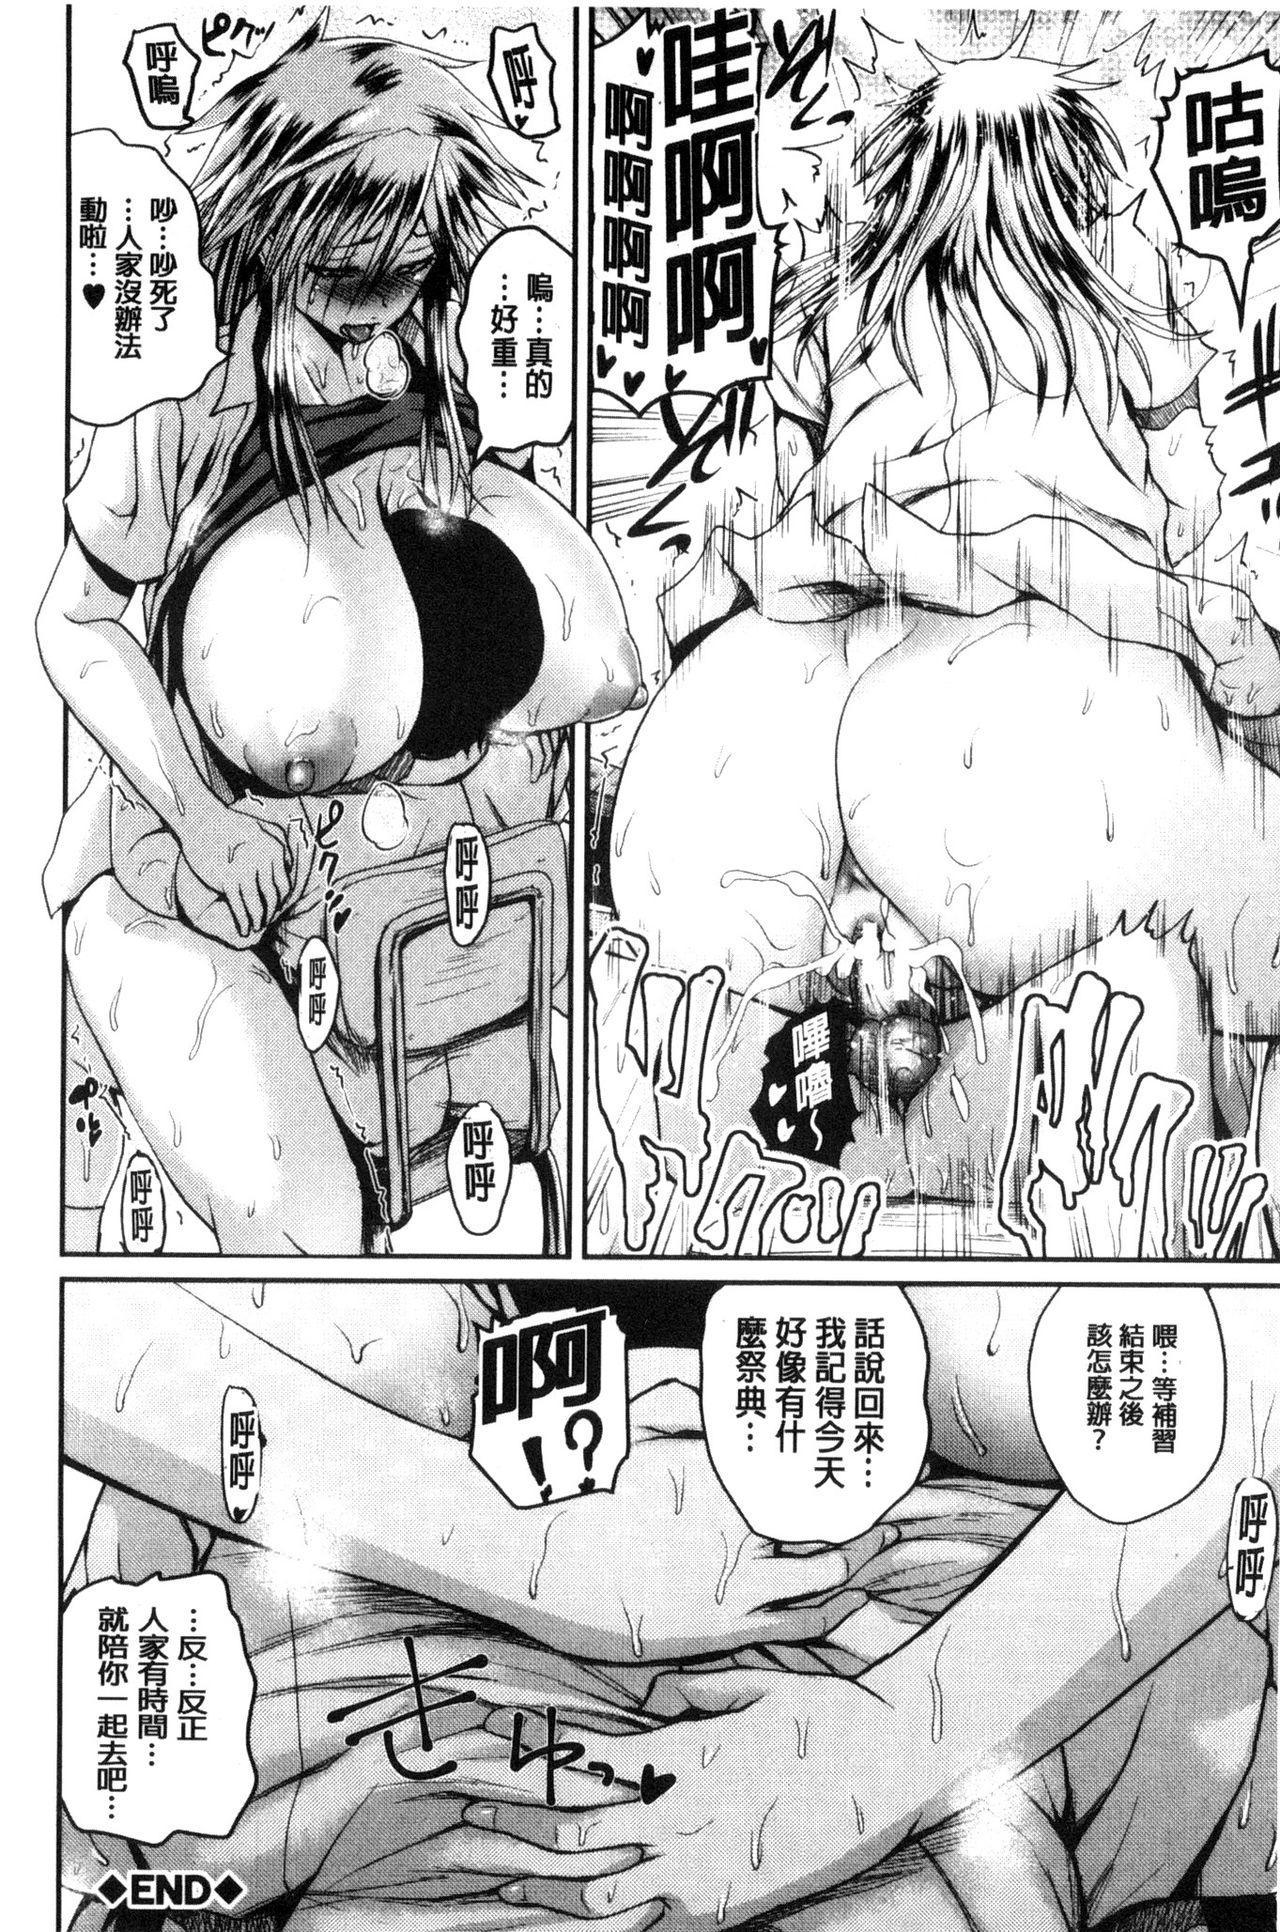 Opink Health Seibo no Fukuin 224